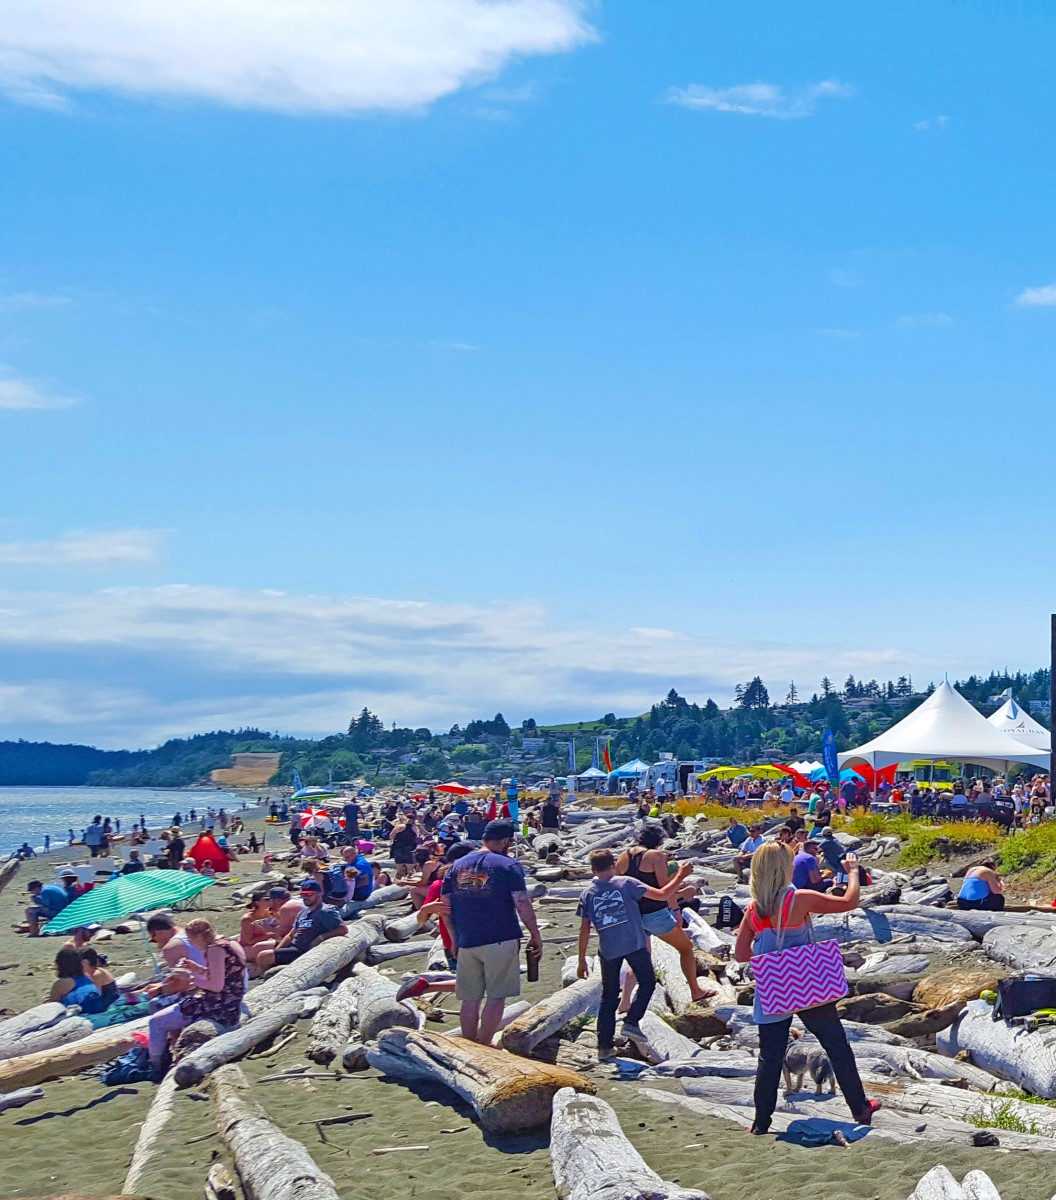 Eats and beats at the beach, Colwood, BC